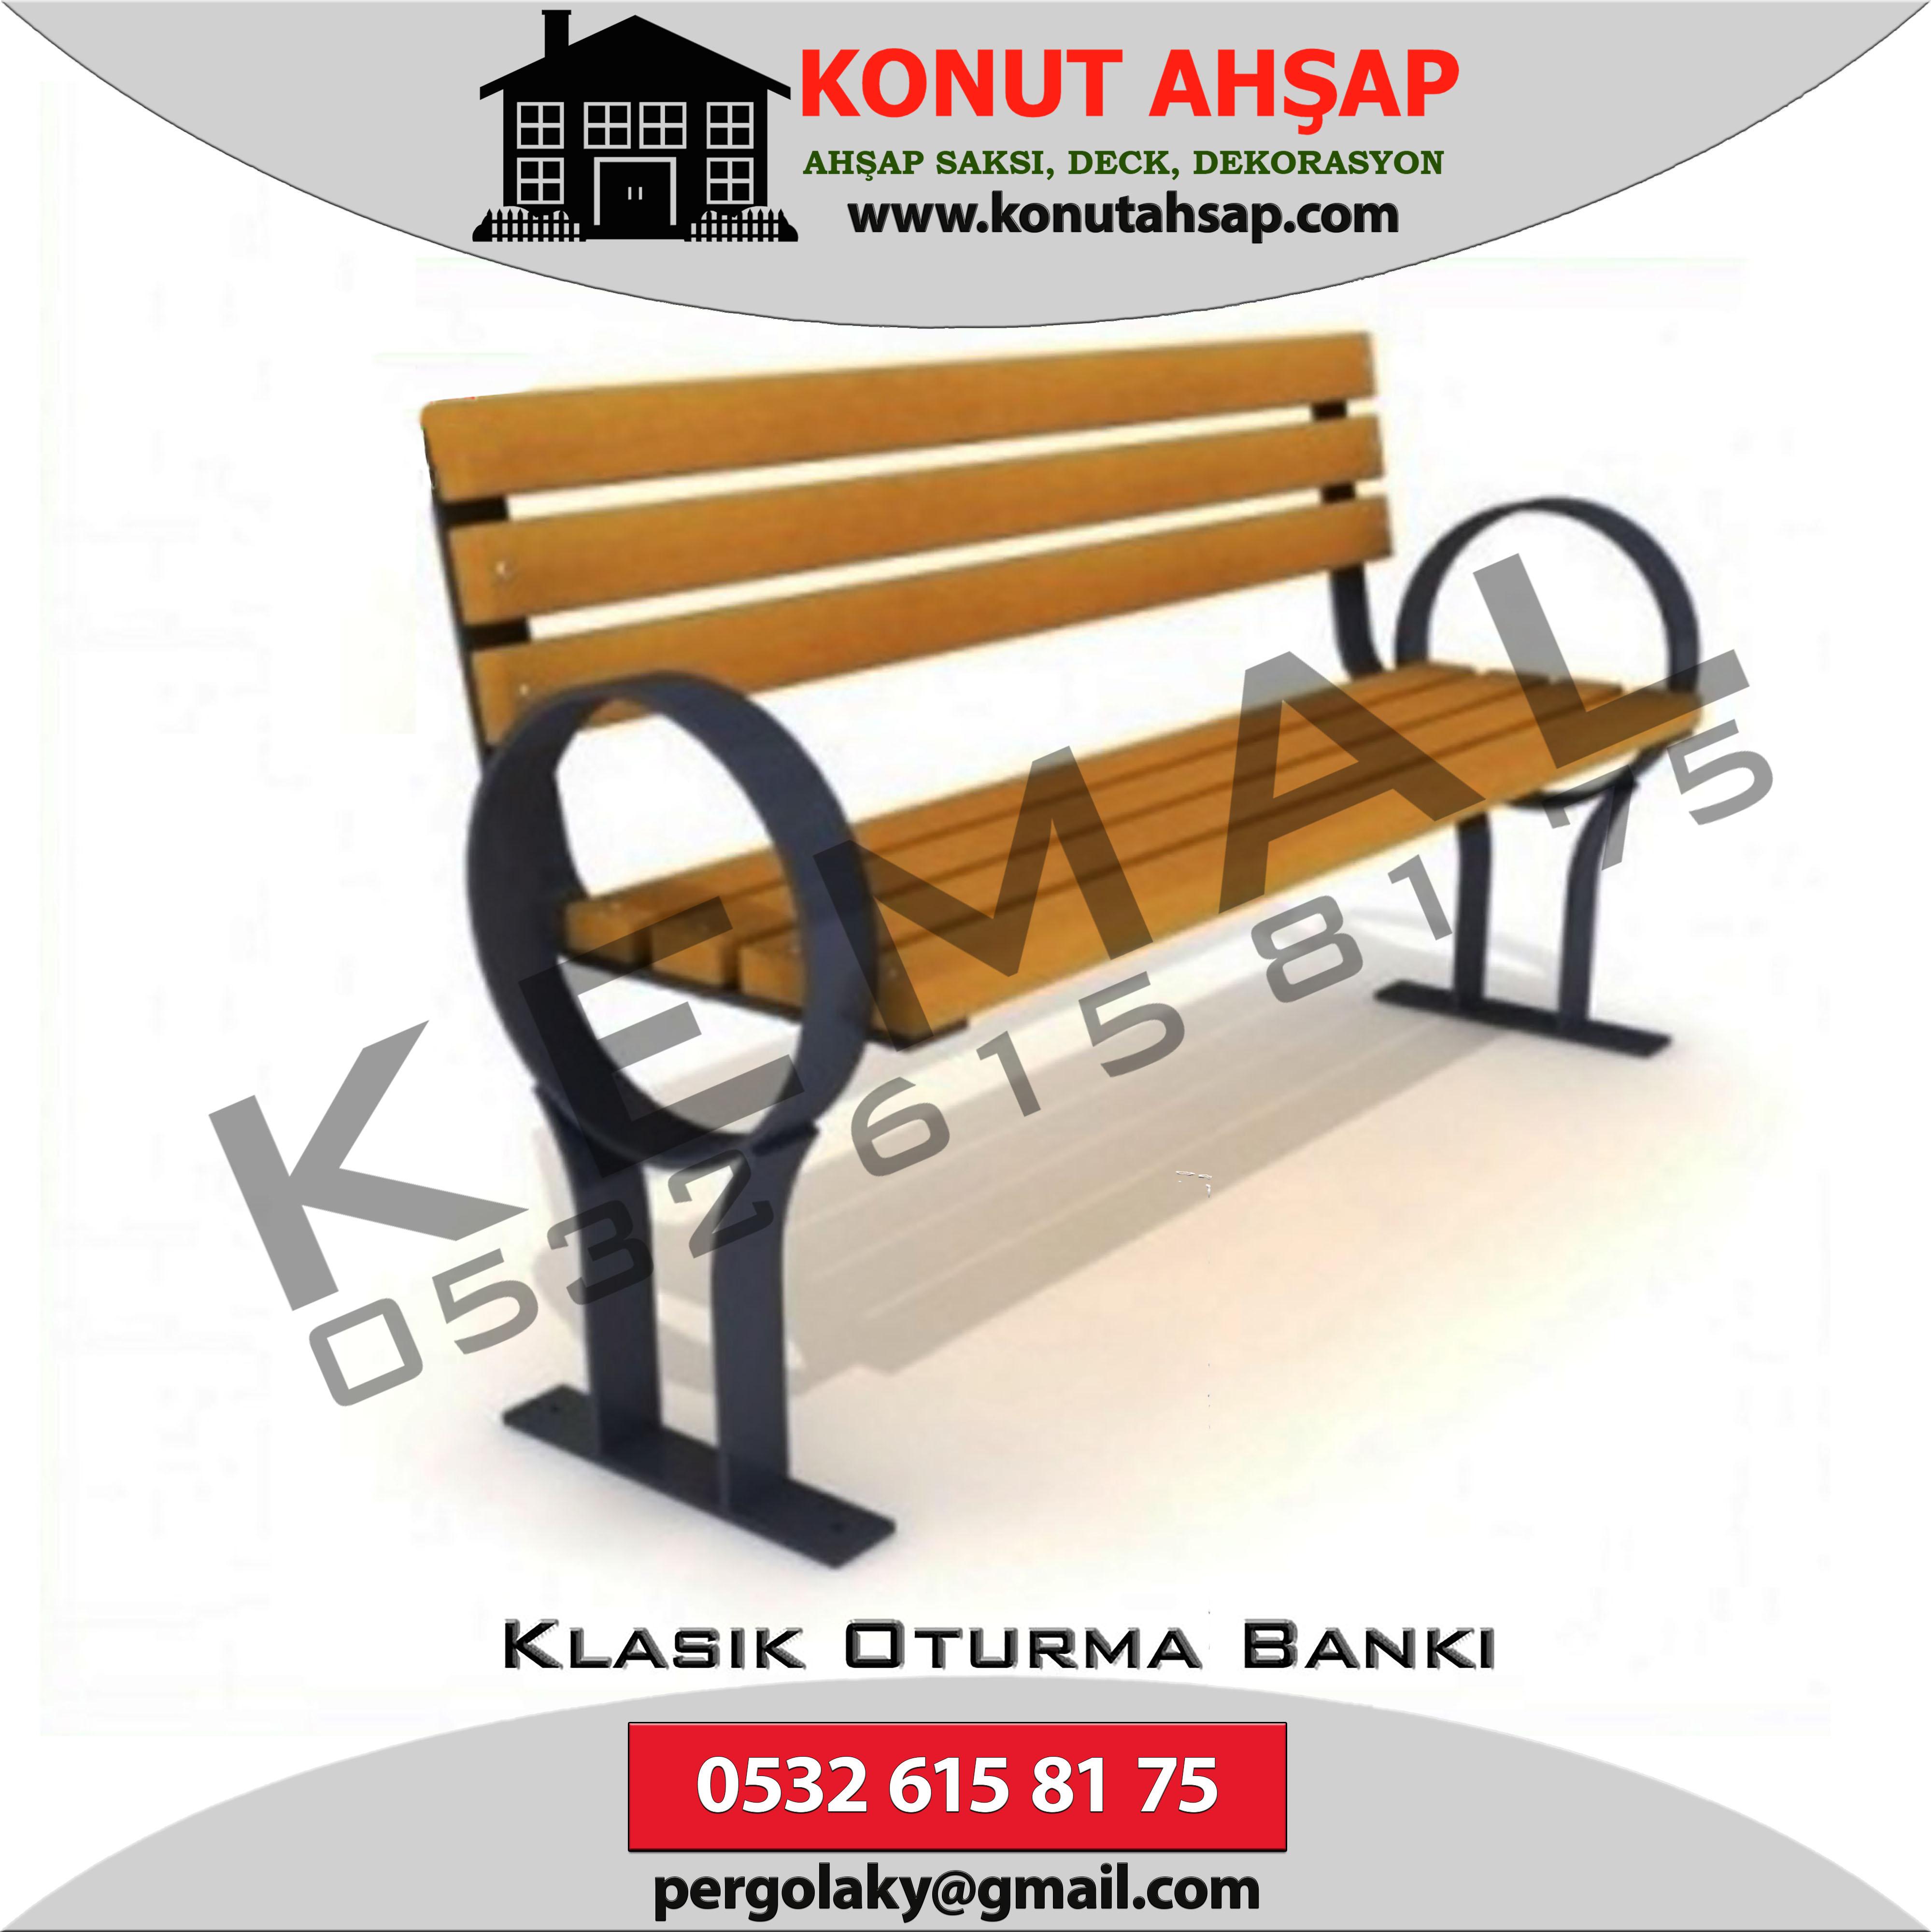 Klasik Oturma Bankı